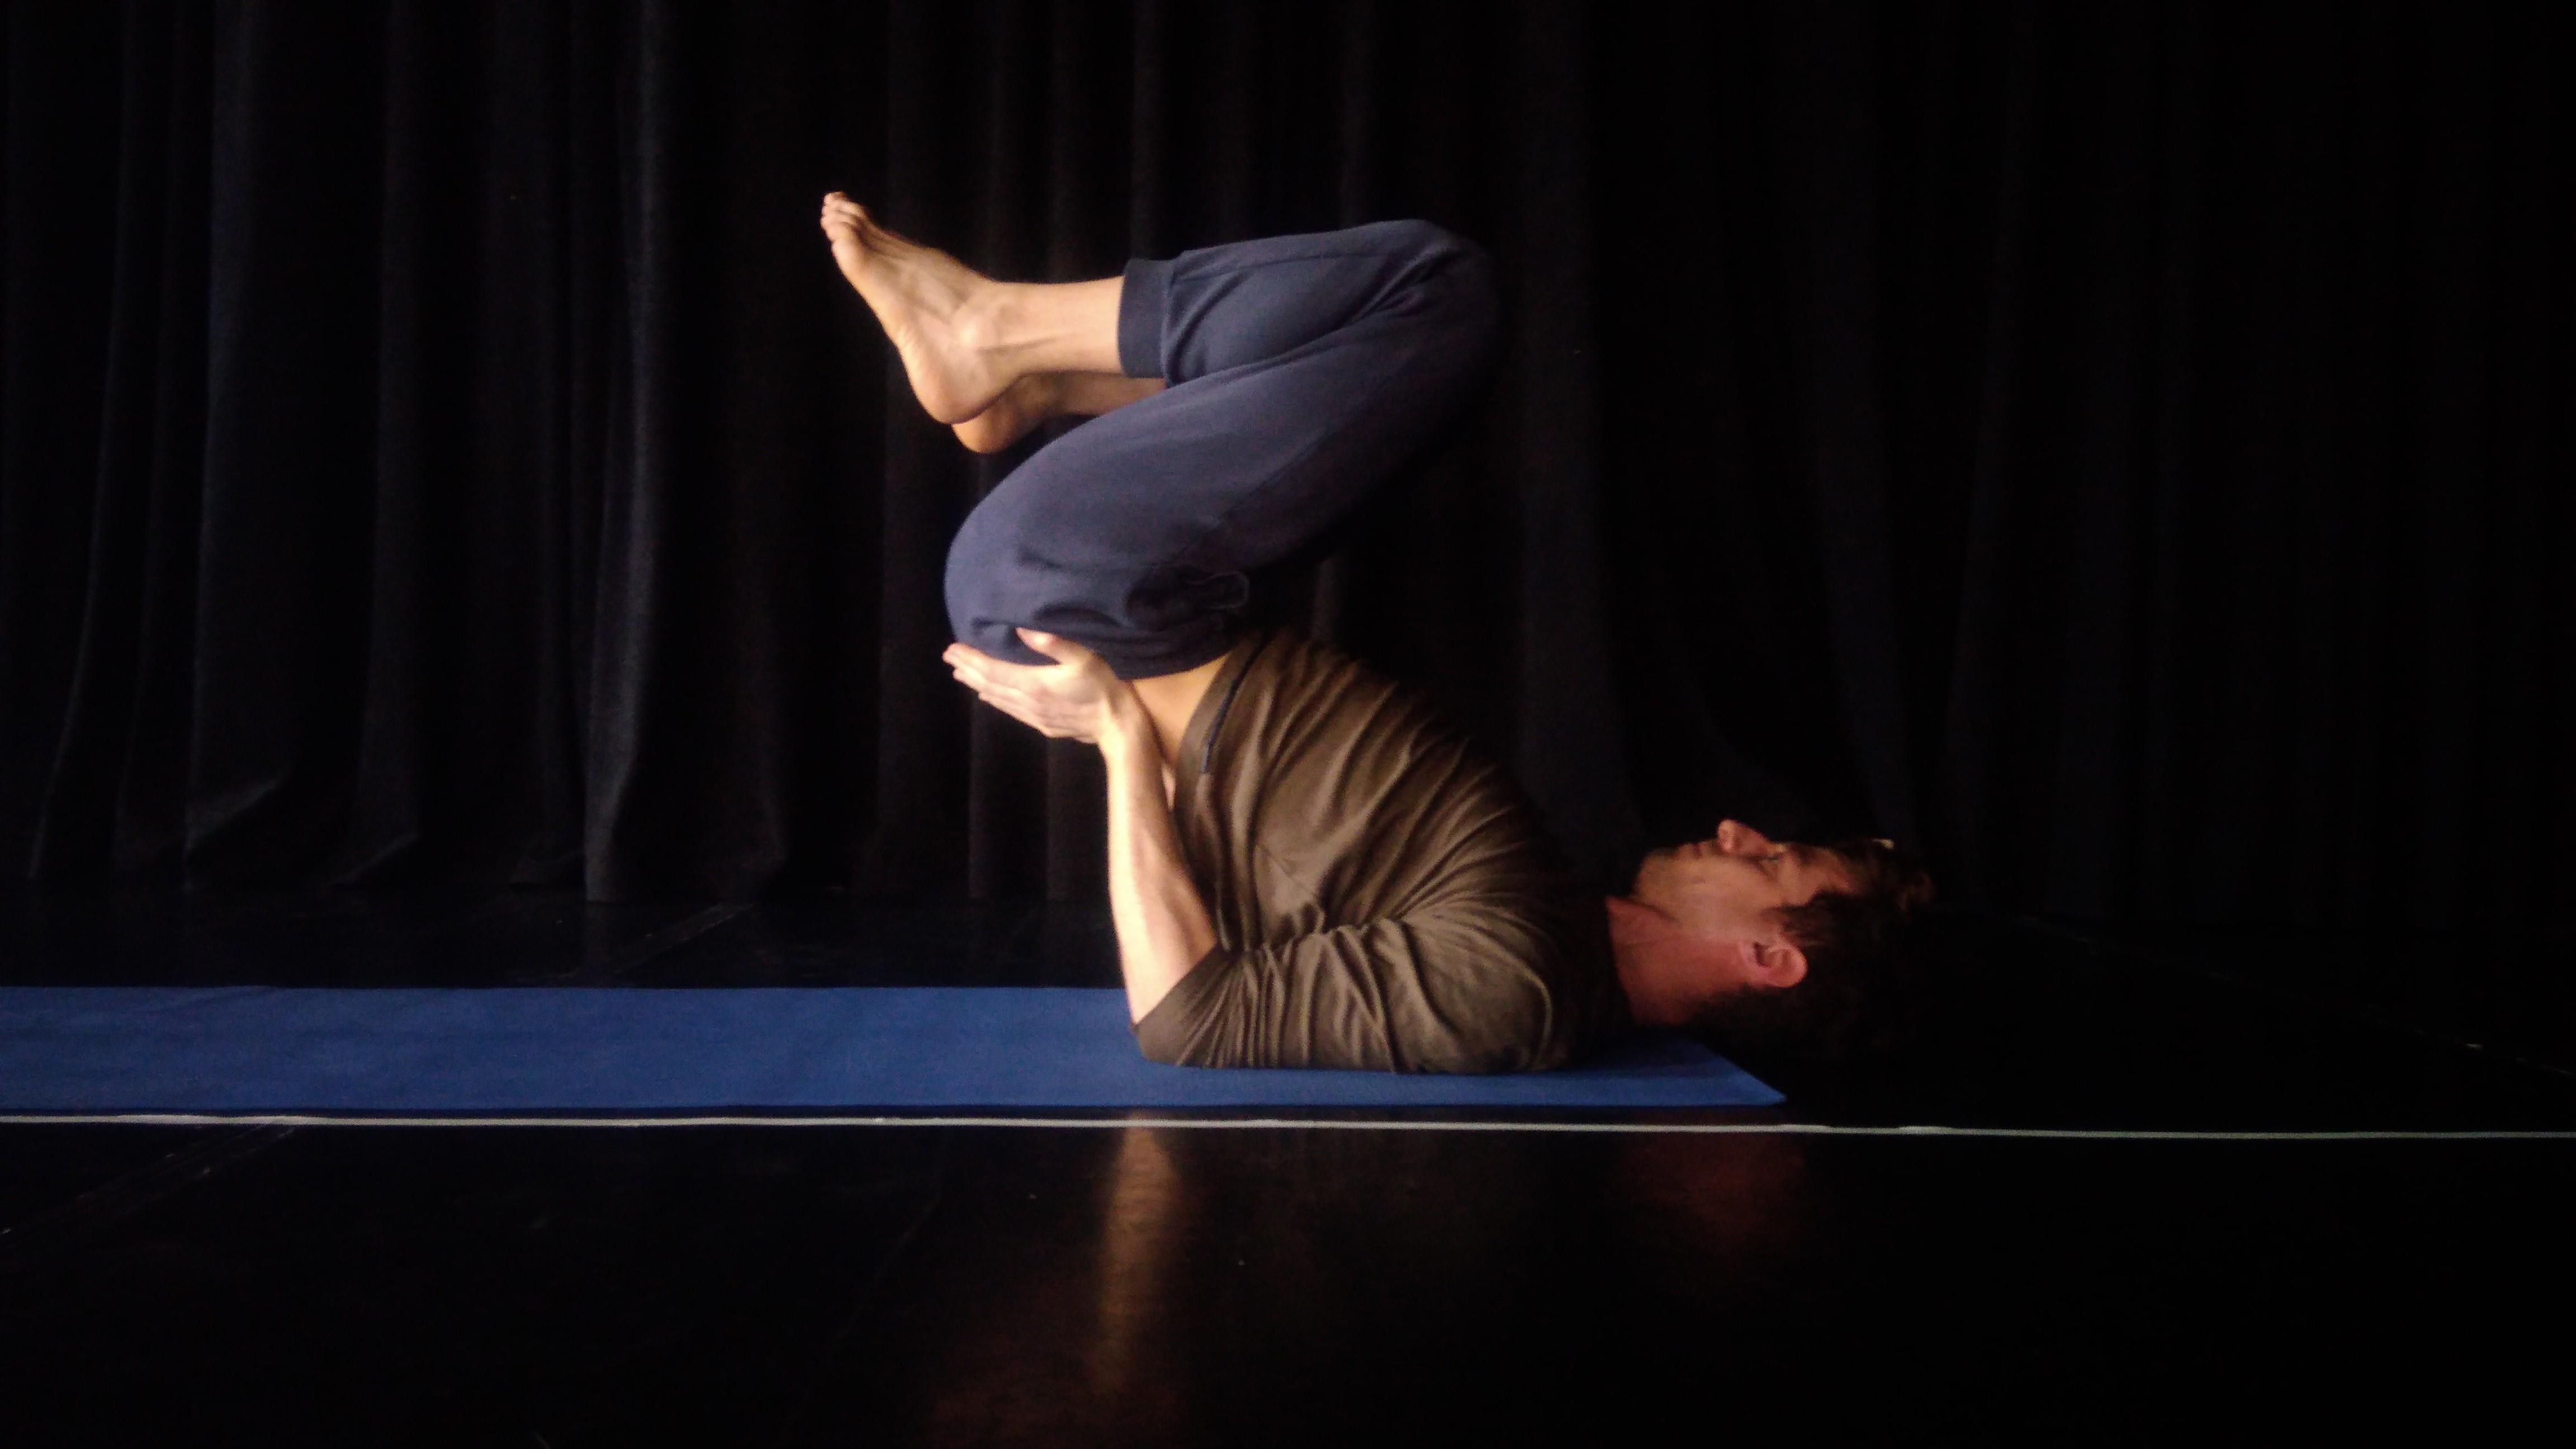 Yoga poze